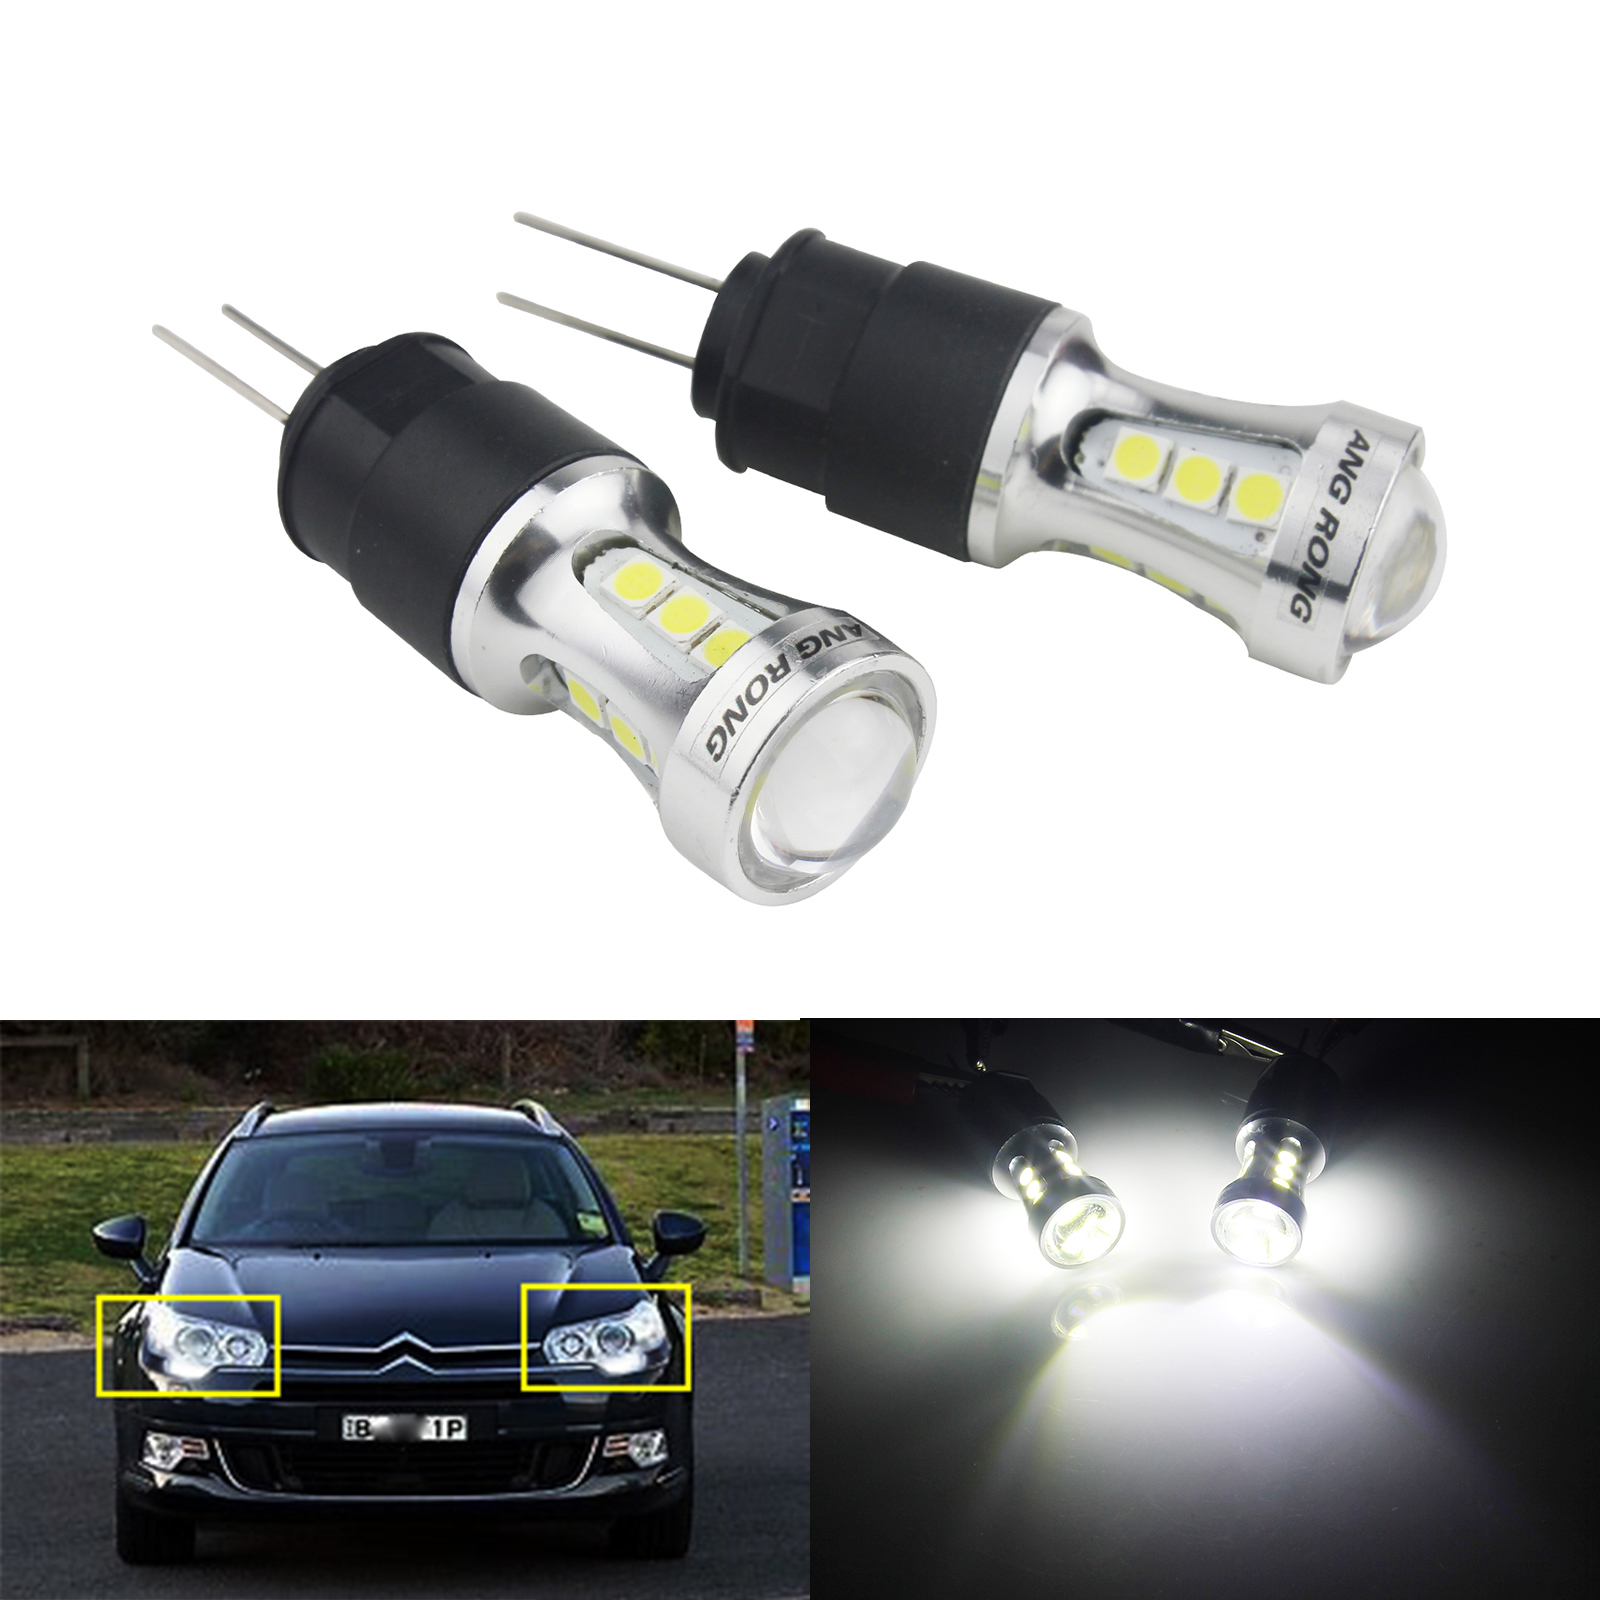 ANGRONG 2x HP24W G4 лампы 18 SMD светодио дный автомобиль день фонари лампы ДРЛ Для Цитрон C5 для peugeot 3008 5008